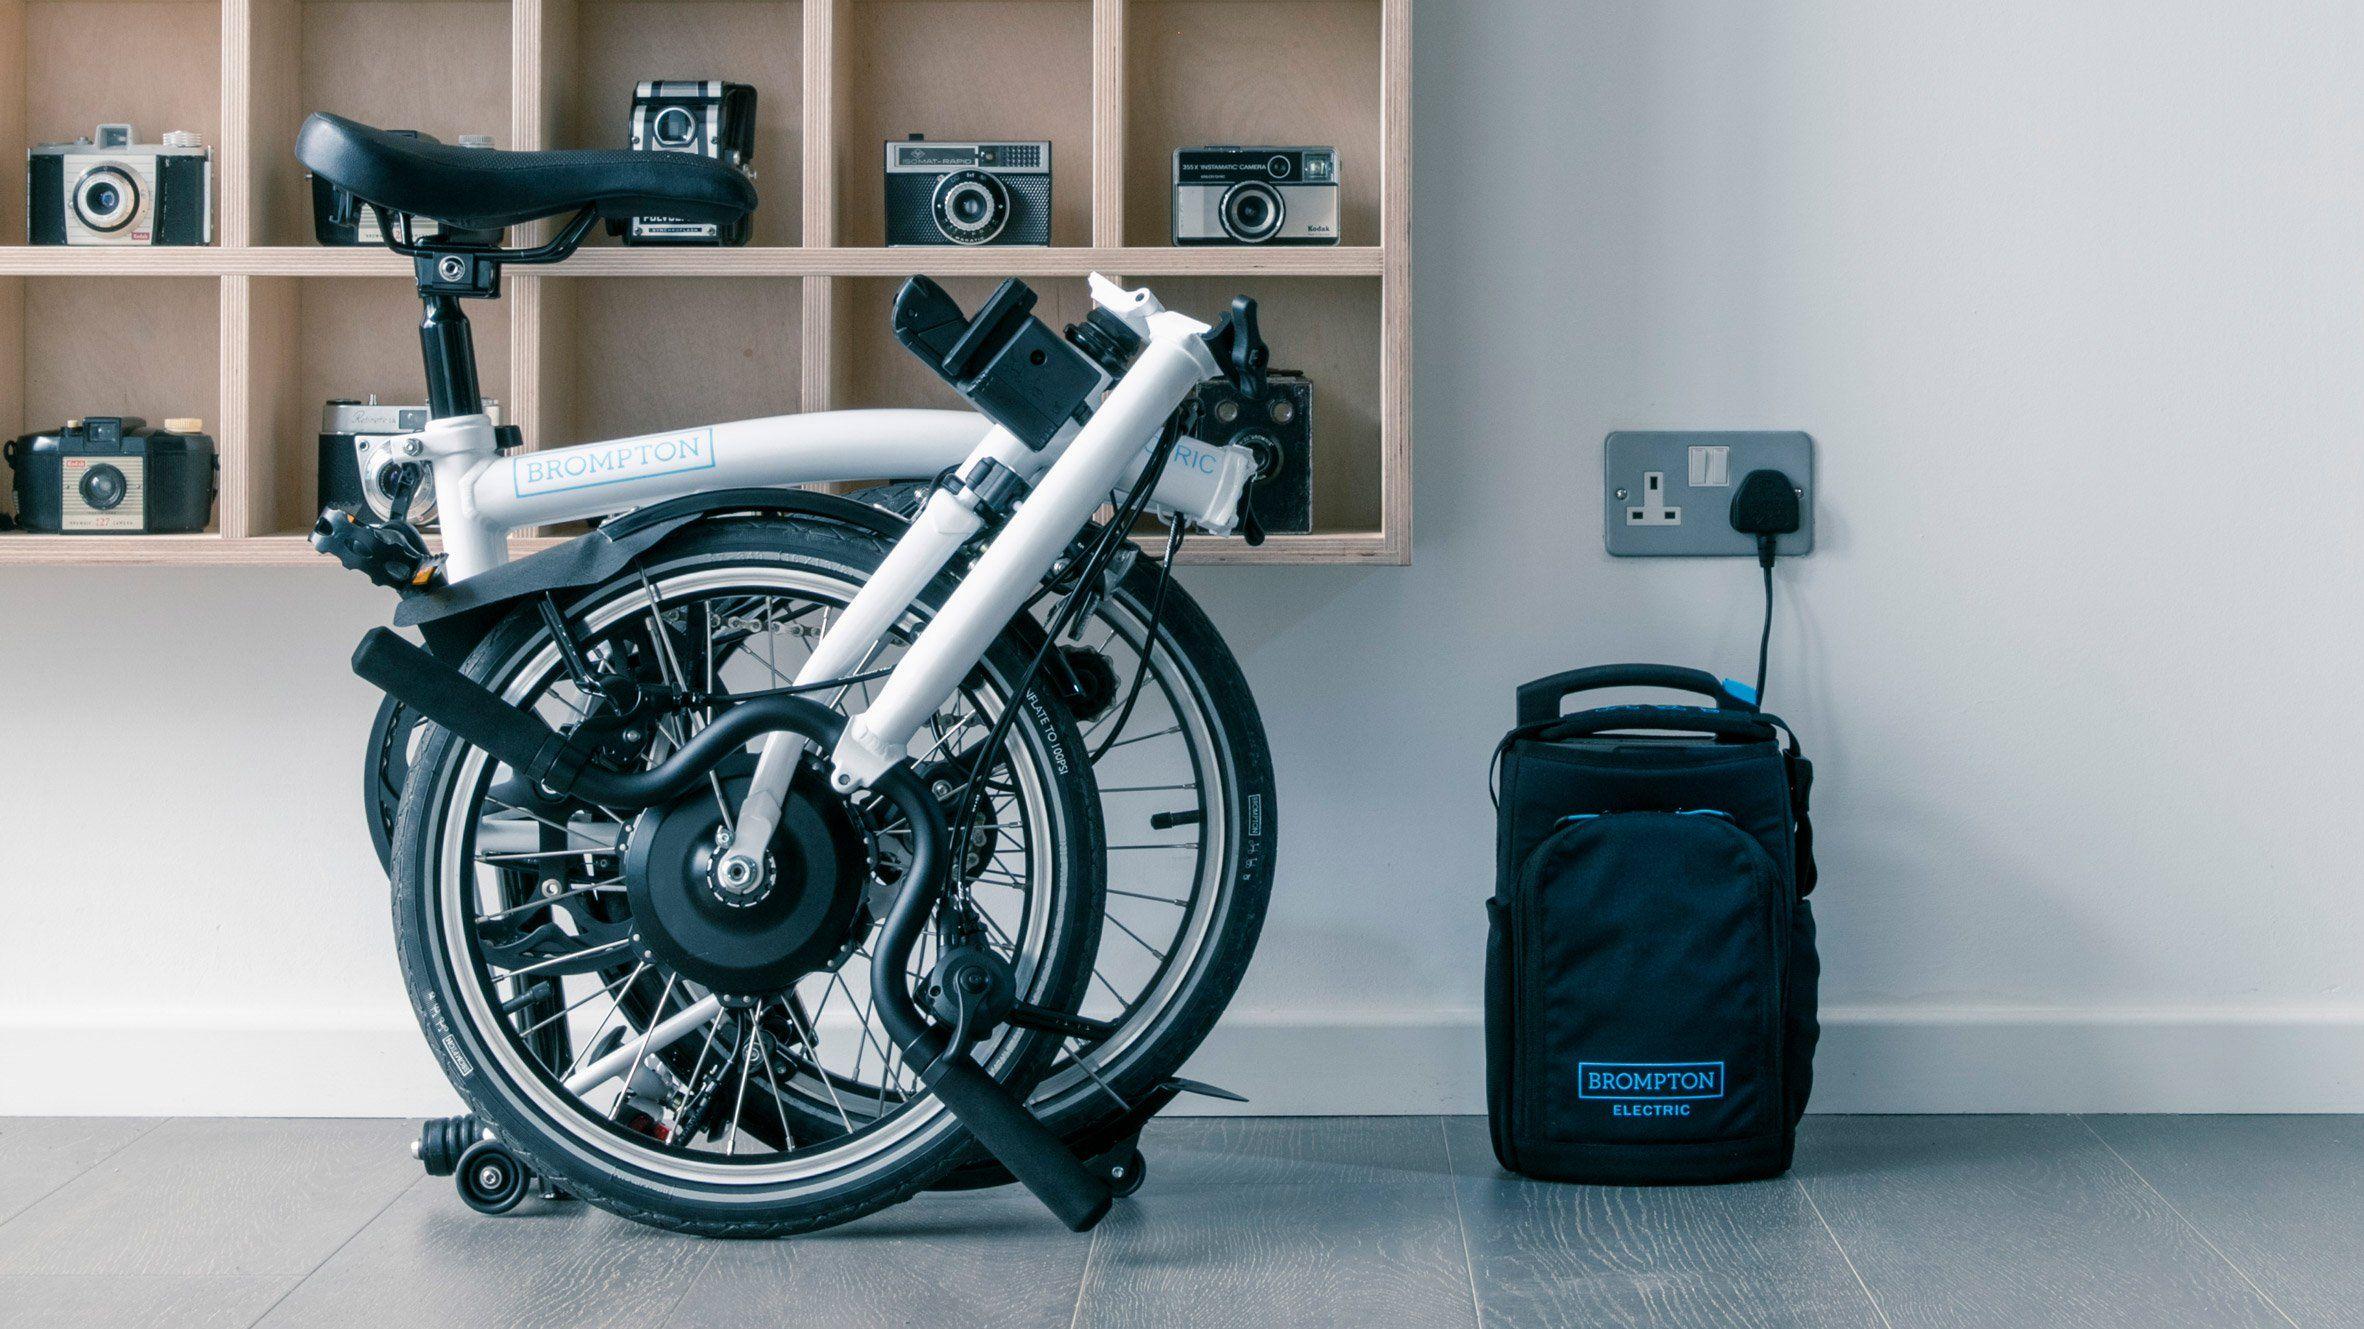 Bicycle Company Brompton Has Borrowed Formula One Racing Technology To Create An Electric Version Of Its Bestselling Foldin Folding Bike Brompton Electric Bike